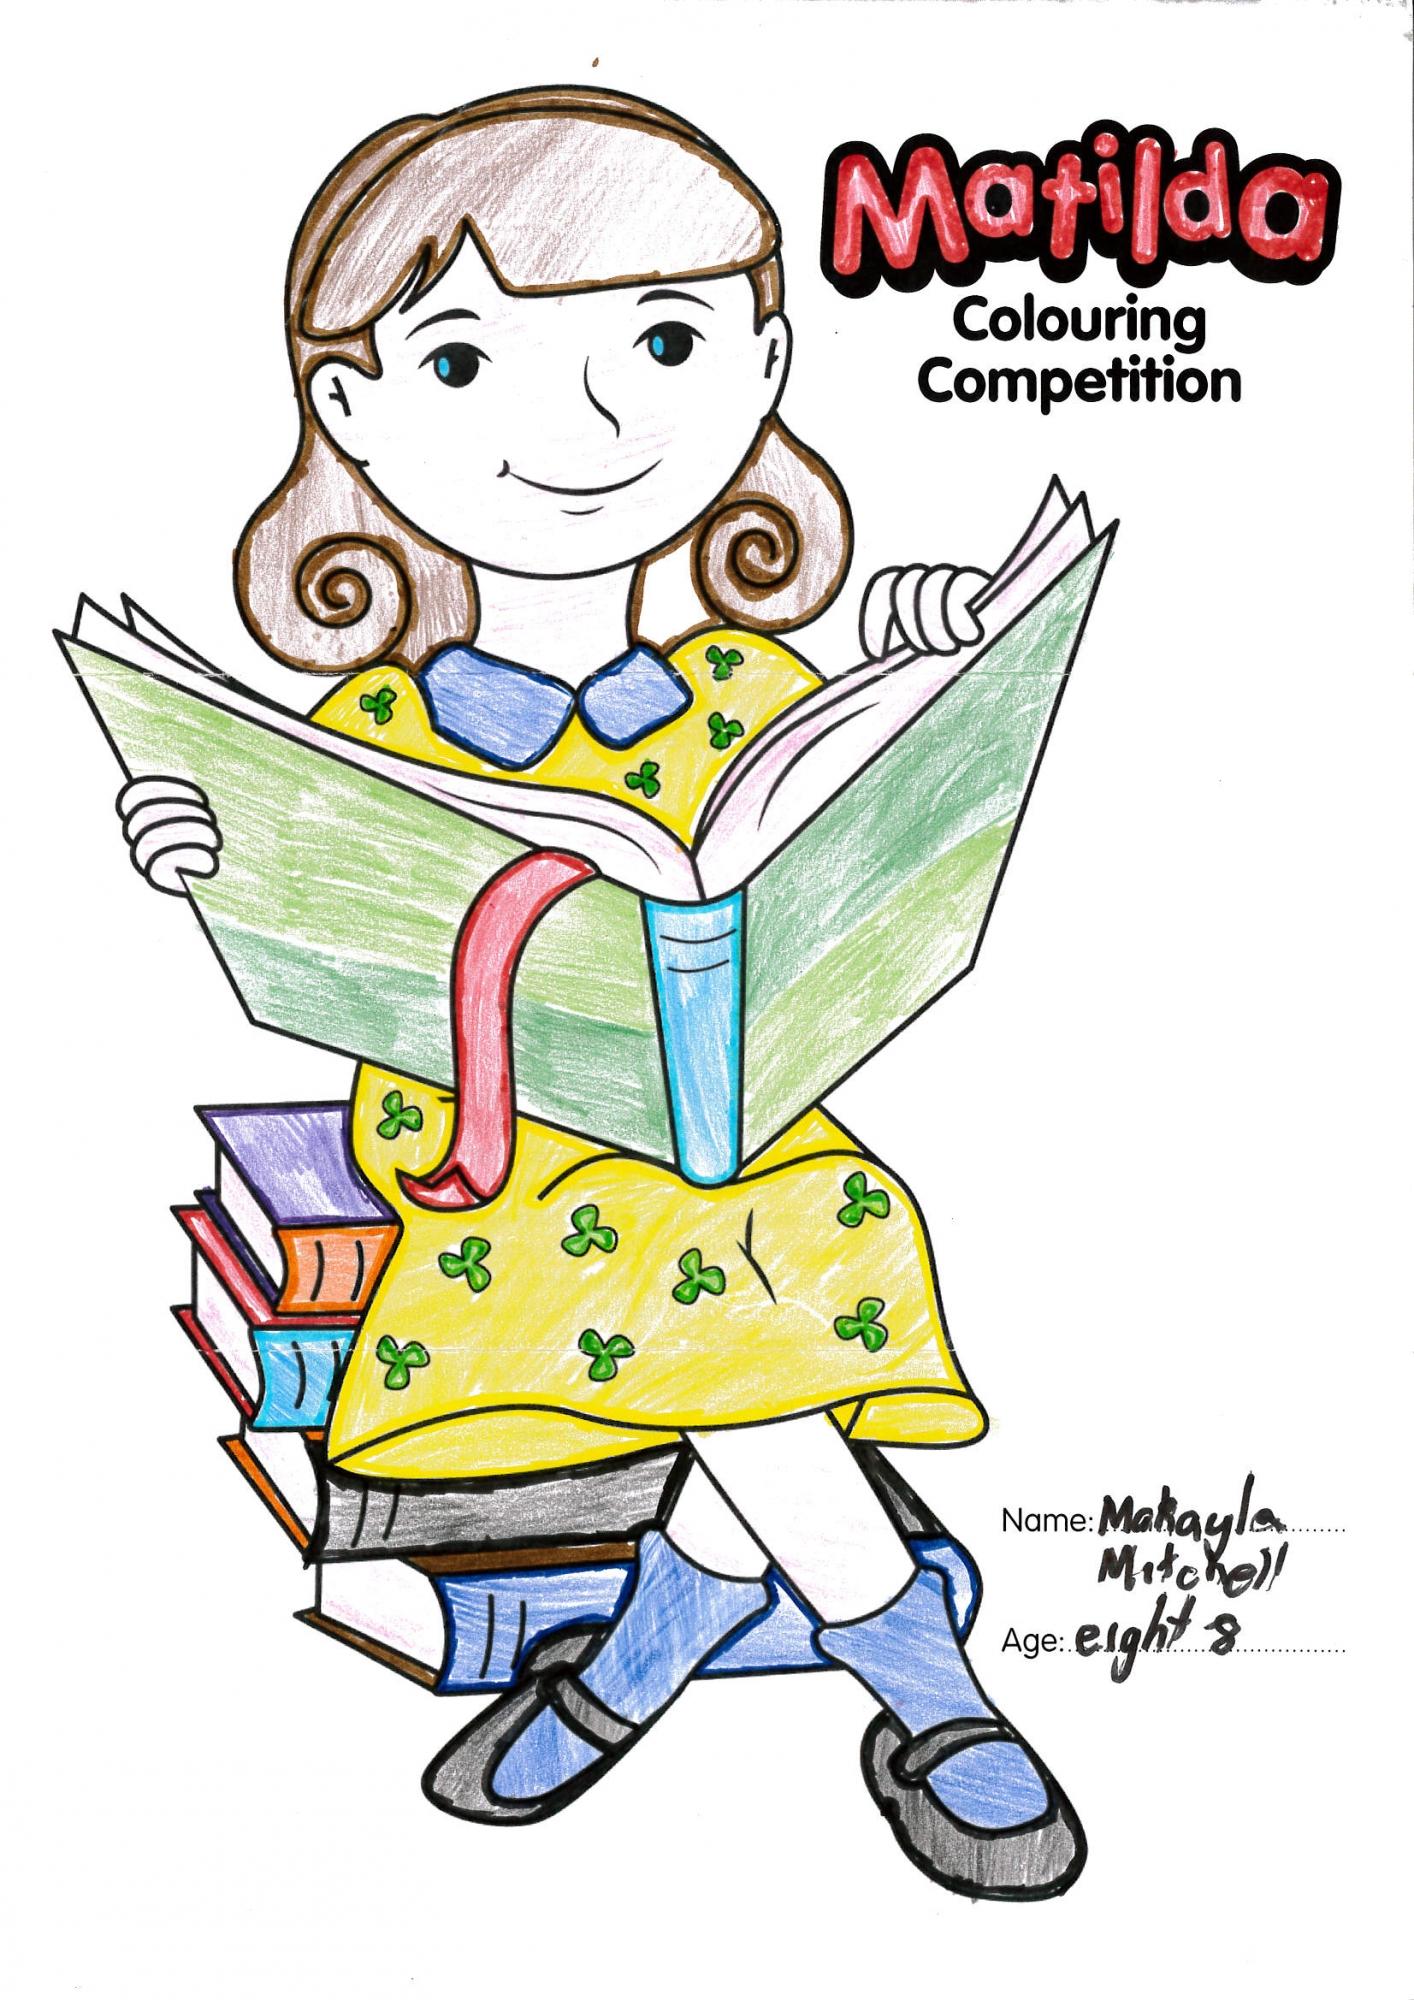 Matilda Winner Colouring